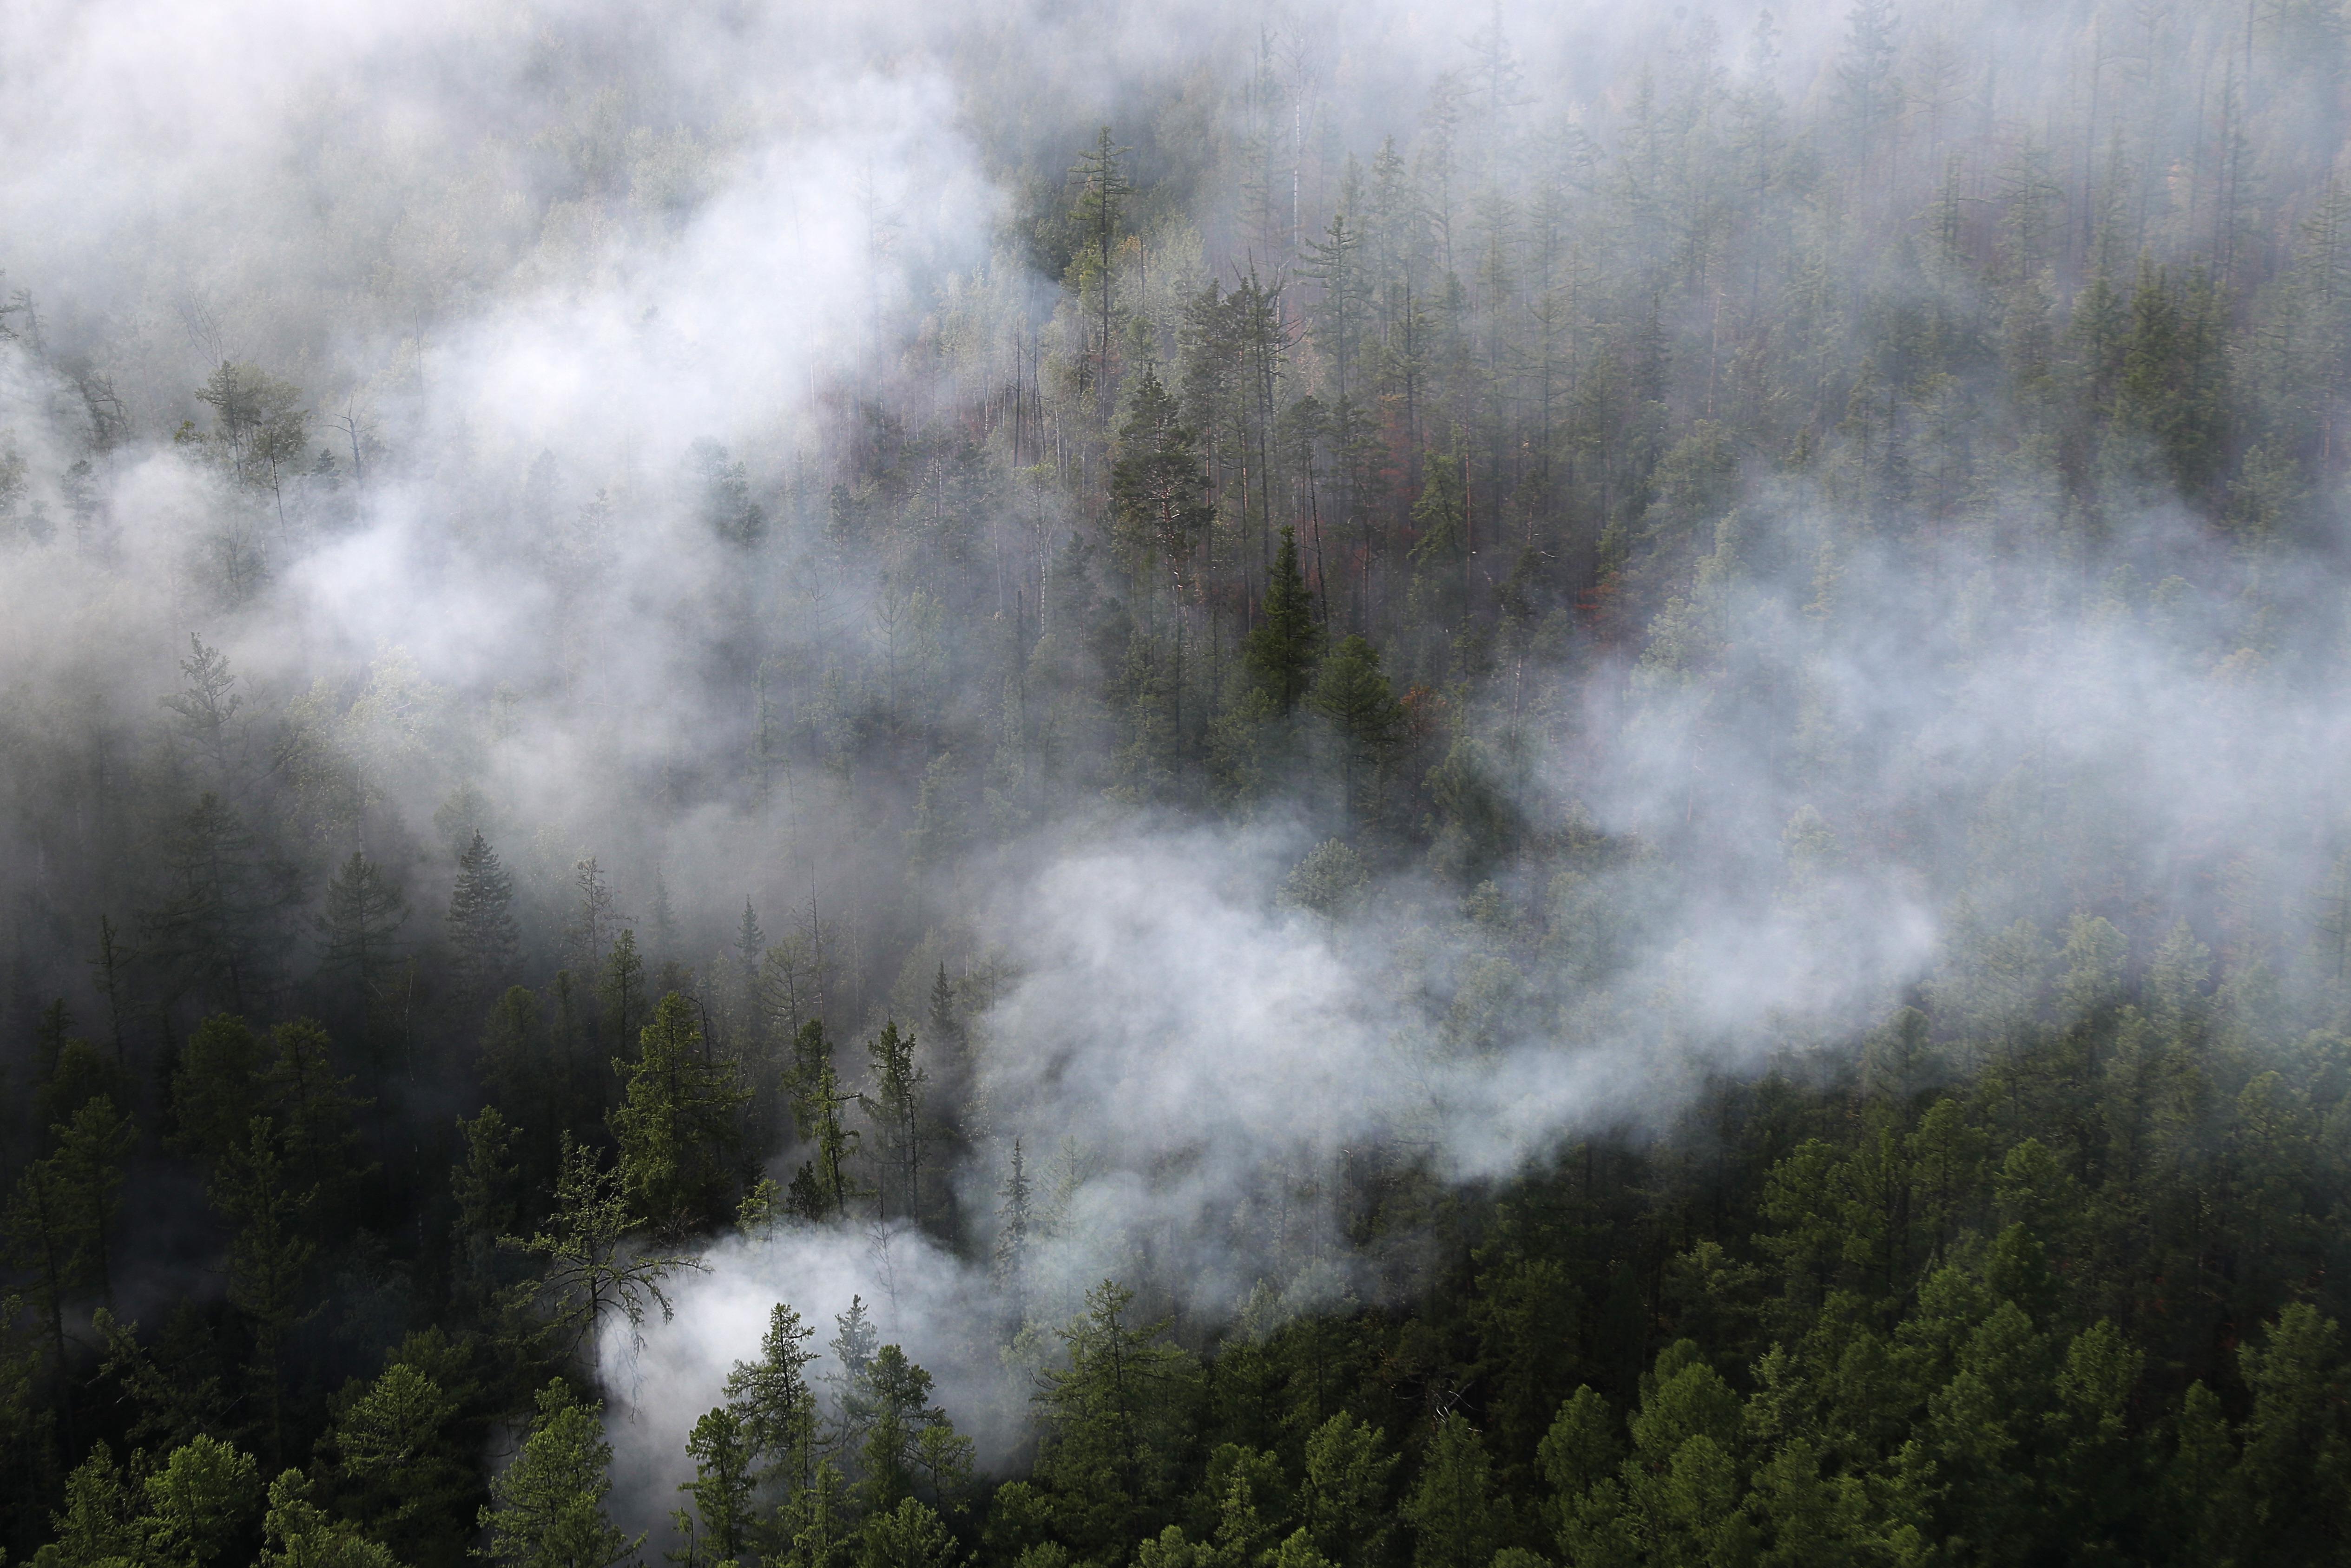 В горах Кабардино-Балкарии зажегся лес